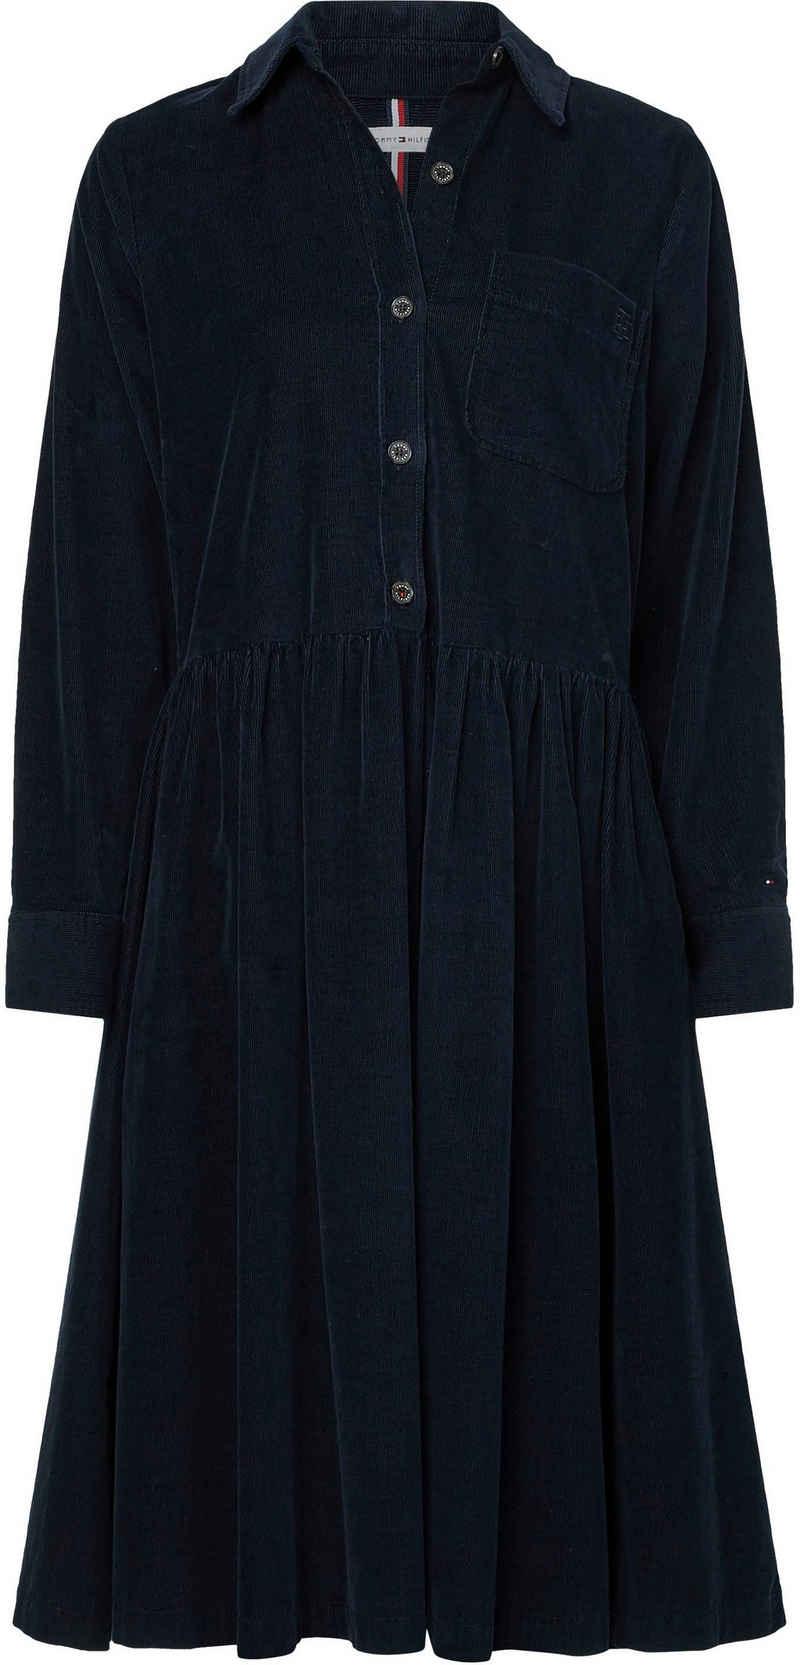 Tommy Hilfiger Blusenkleid »CORDUROY KNEE SHIRT DRESS LS« aus Feincord